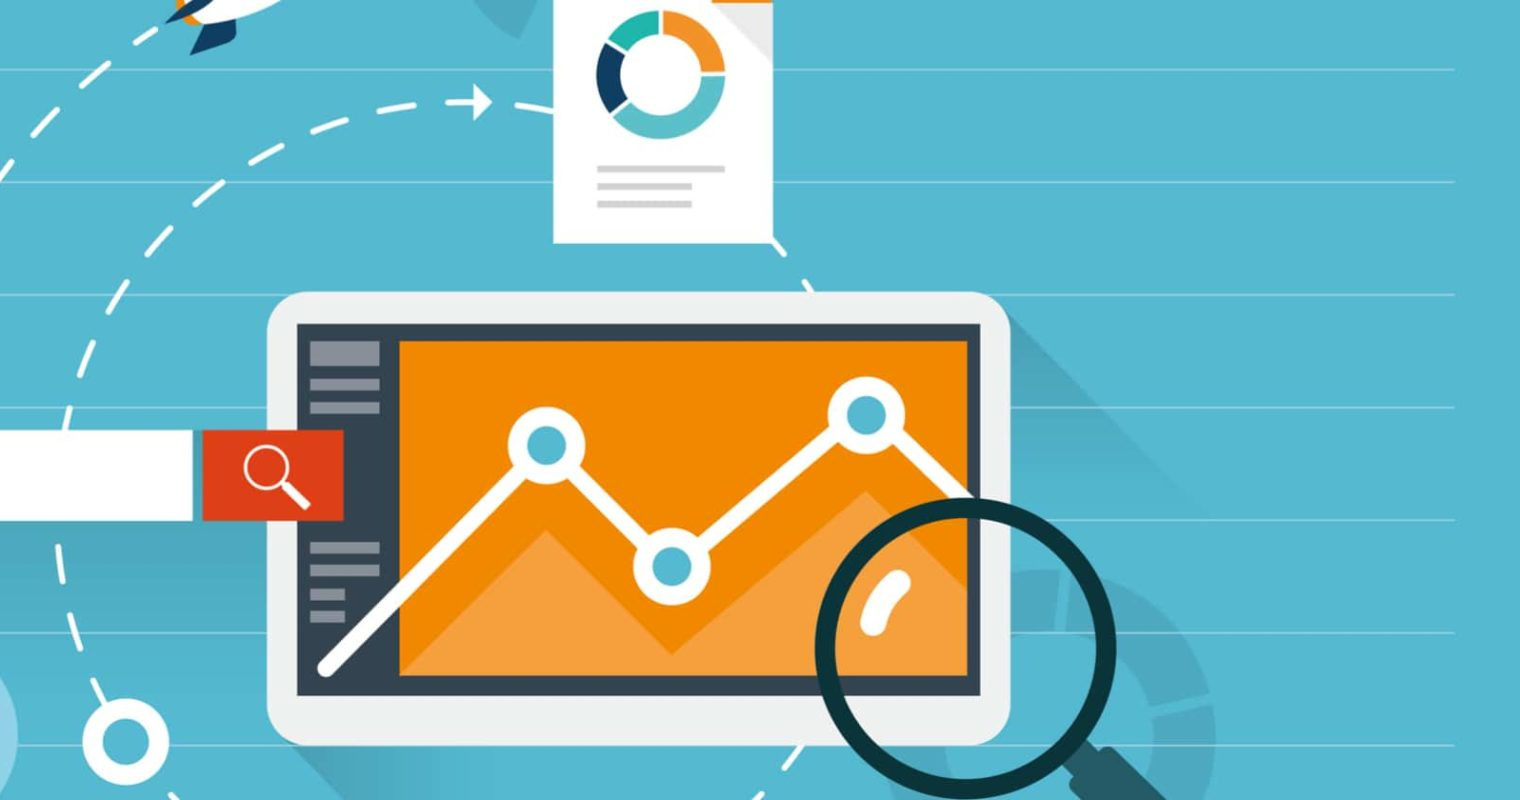 Survey Shows Users Prefer AMP Over Regular Content